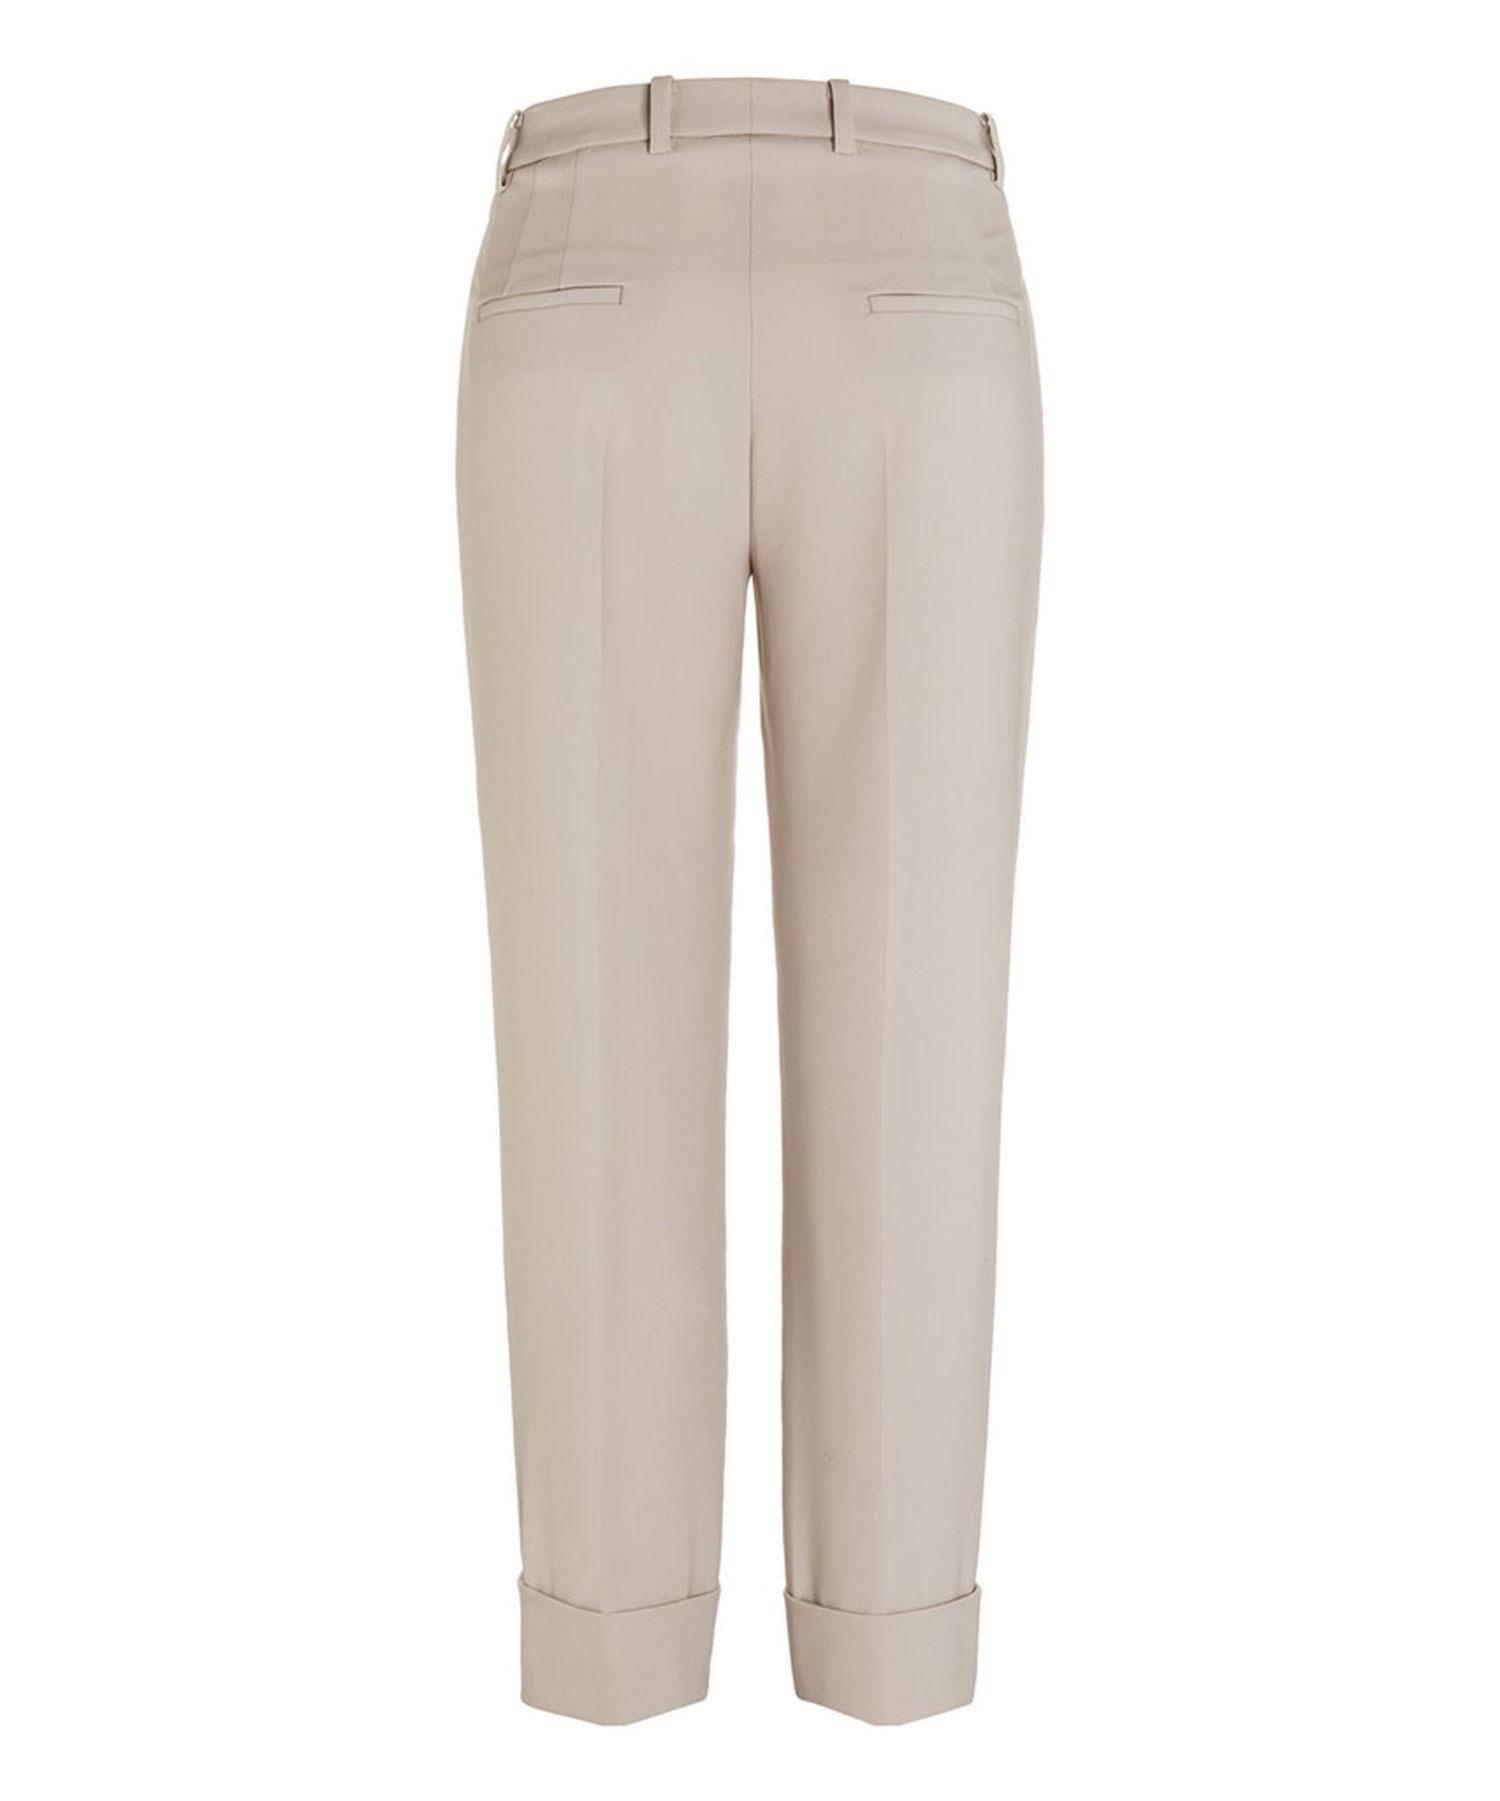 Cambio pantalon Krystal